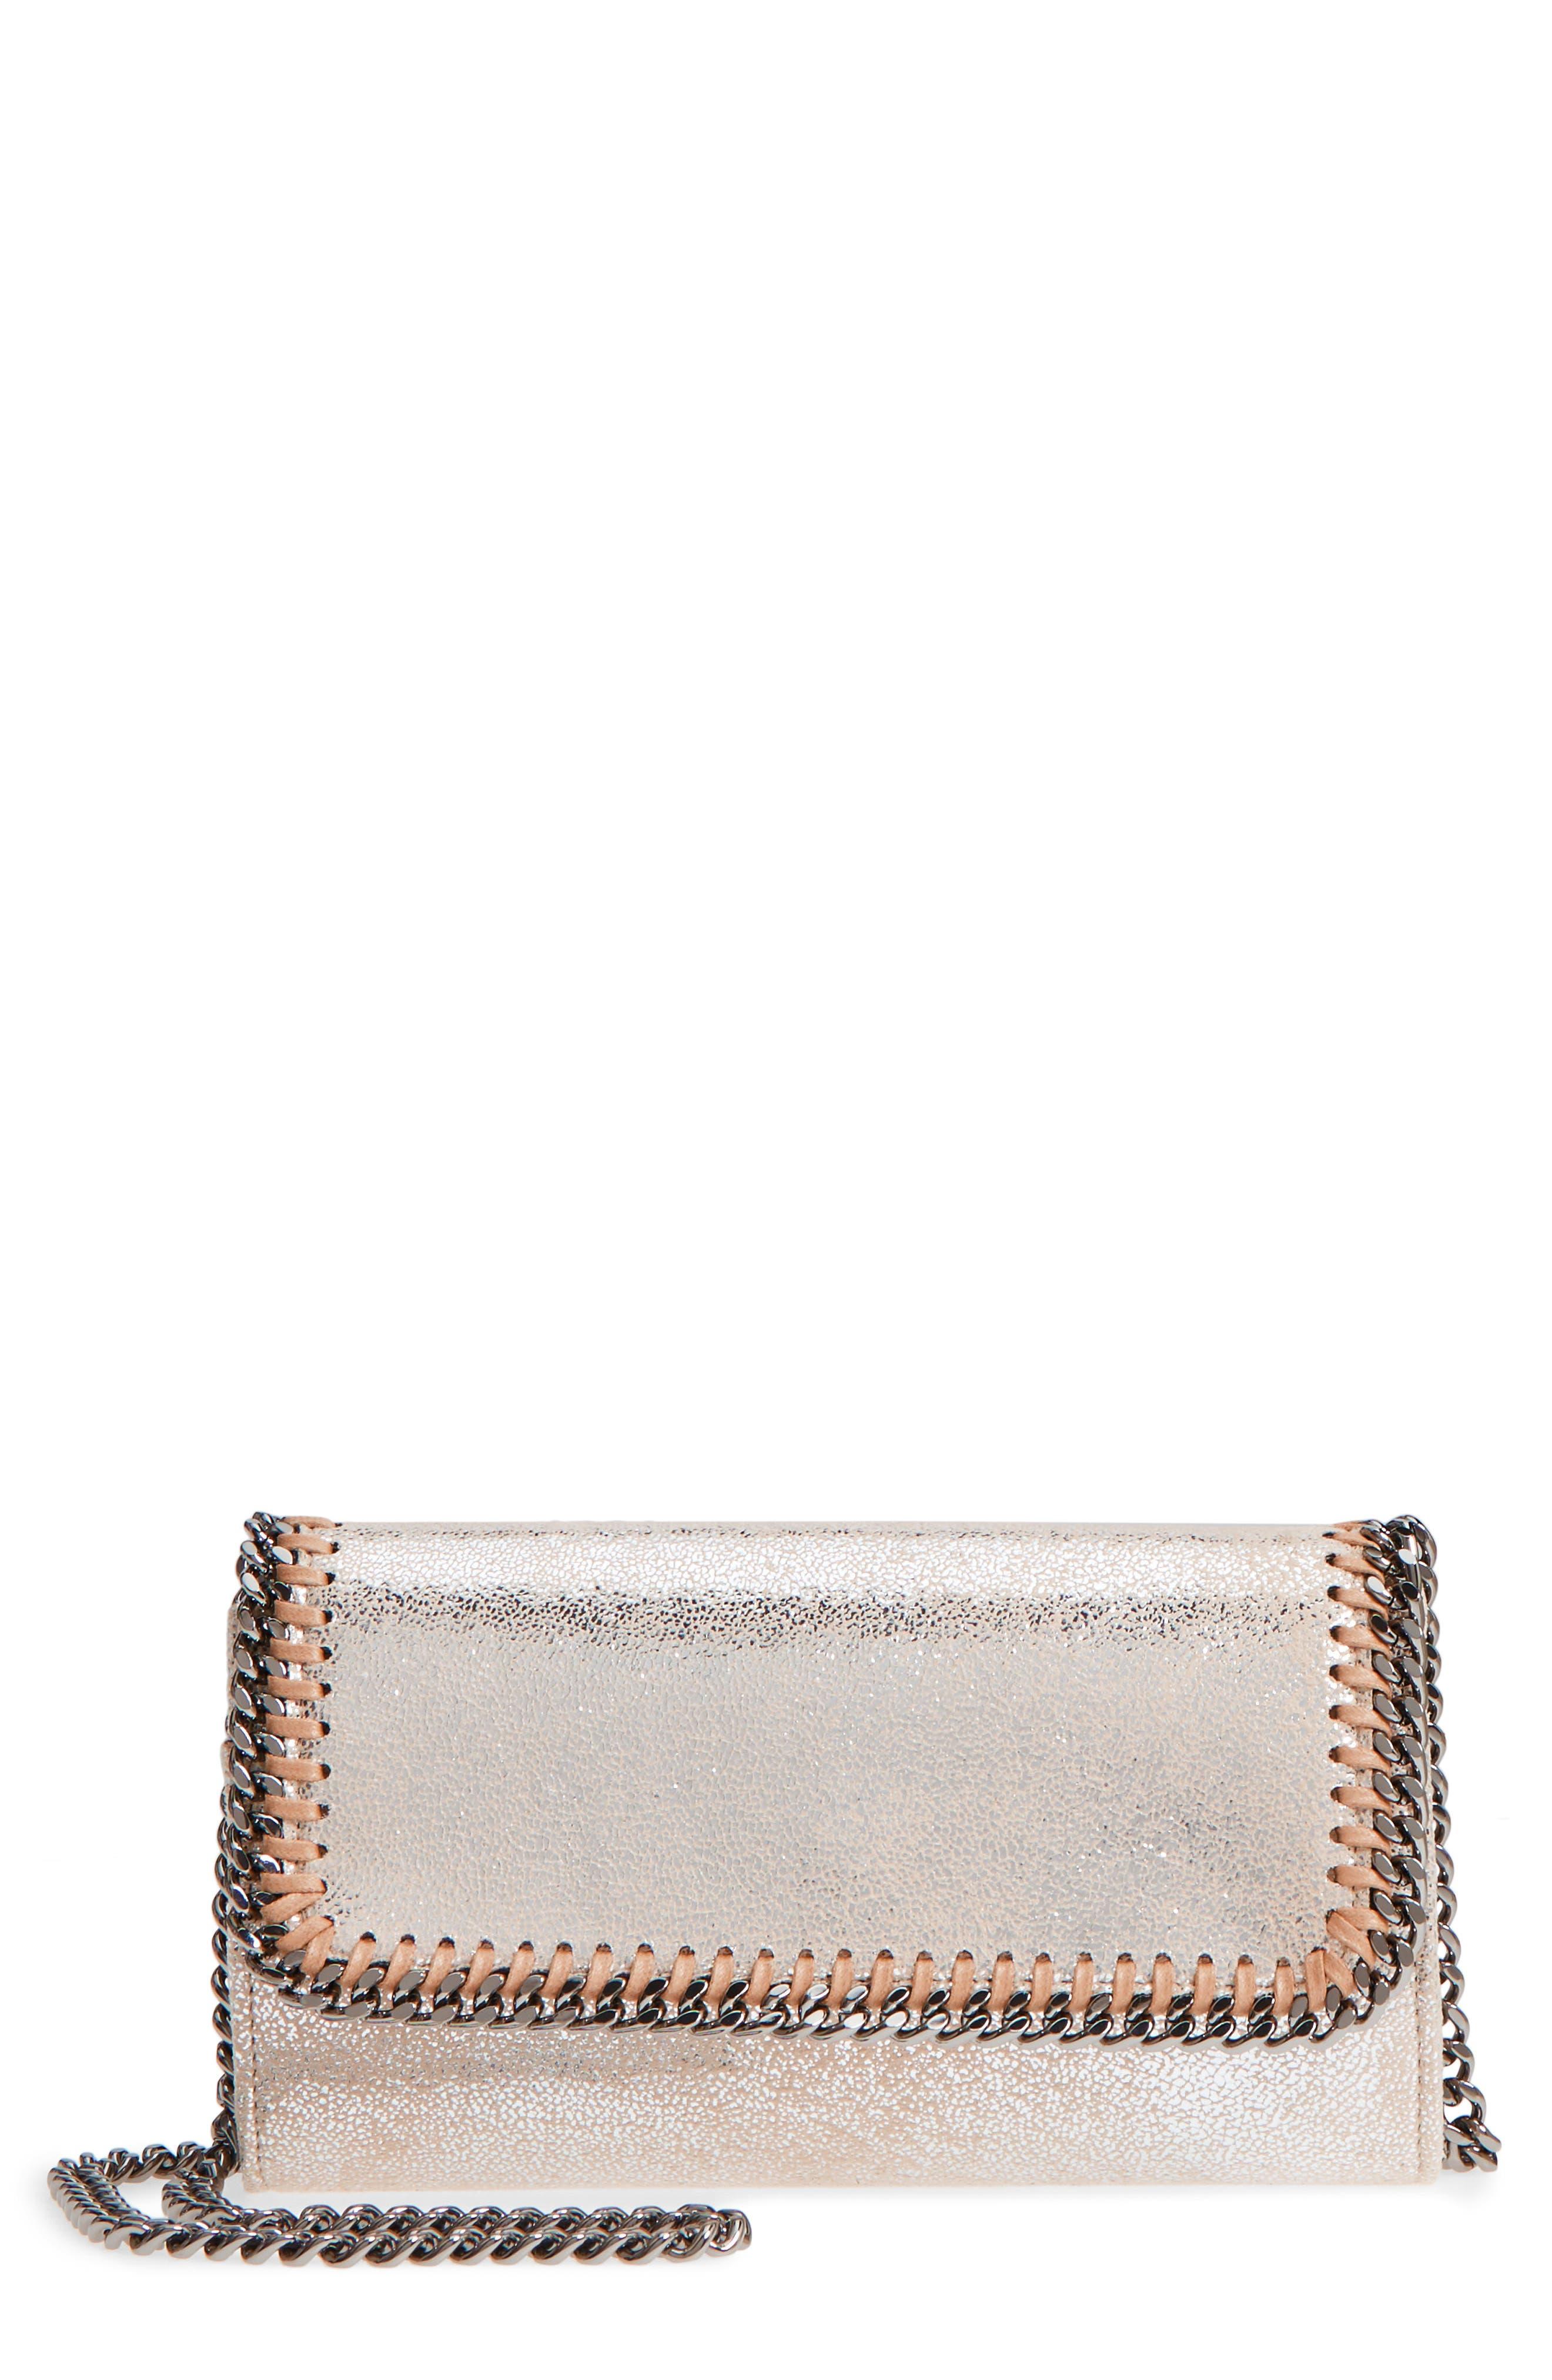 a69ccb115913d Stella Mccartney Falabella Metallic Faux Chamois Crossbody Bag - Metallic  In Pale Gold